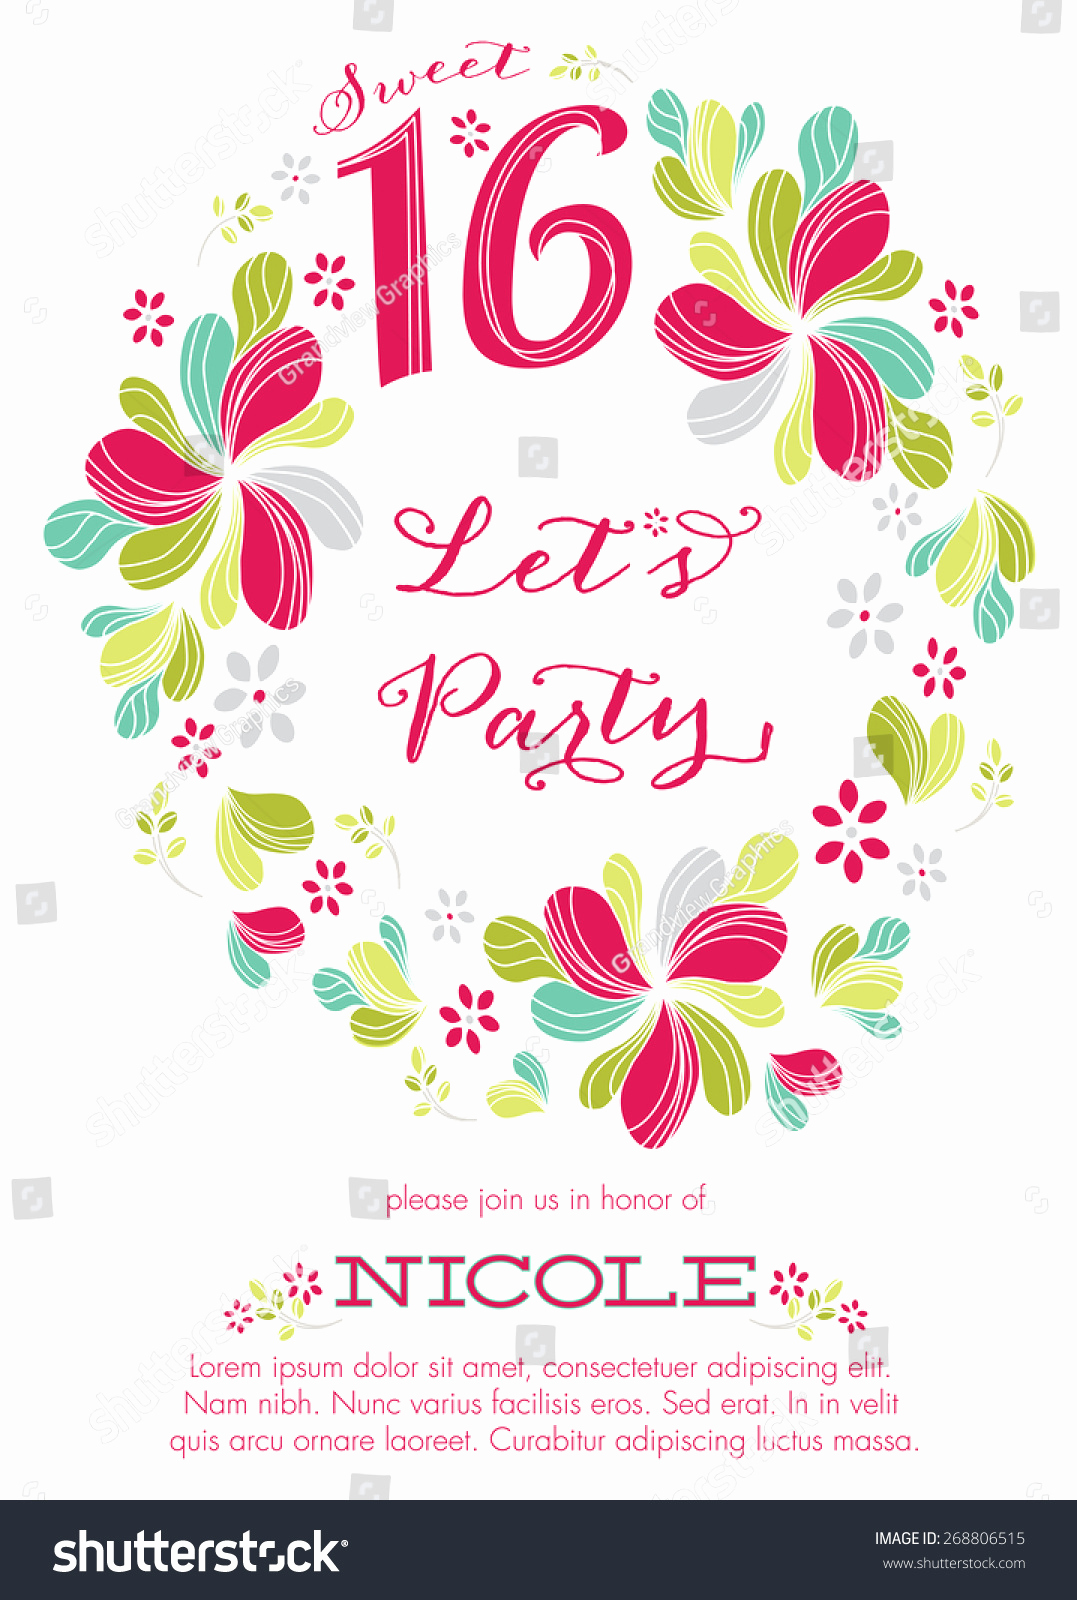 Sweet 16 Invitation Template Fresh Sweet Sixteen Party Invitation Template Vector Stock